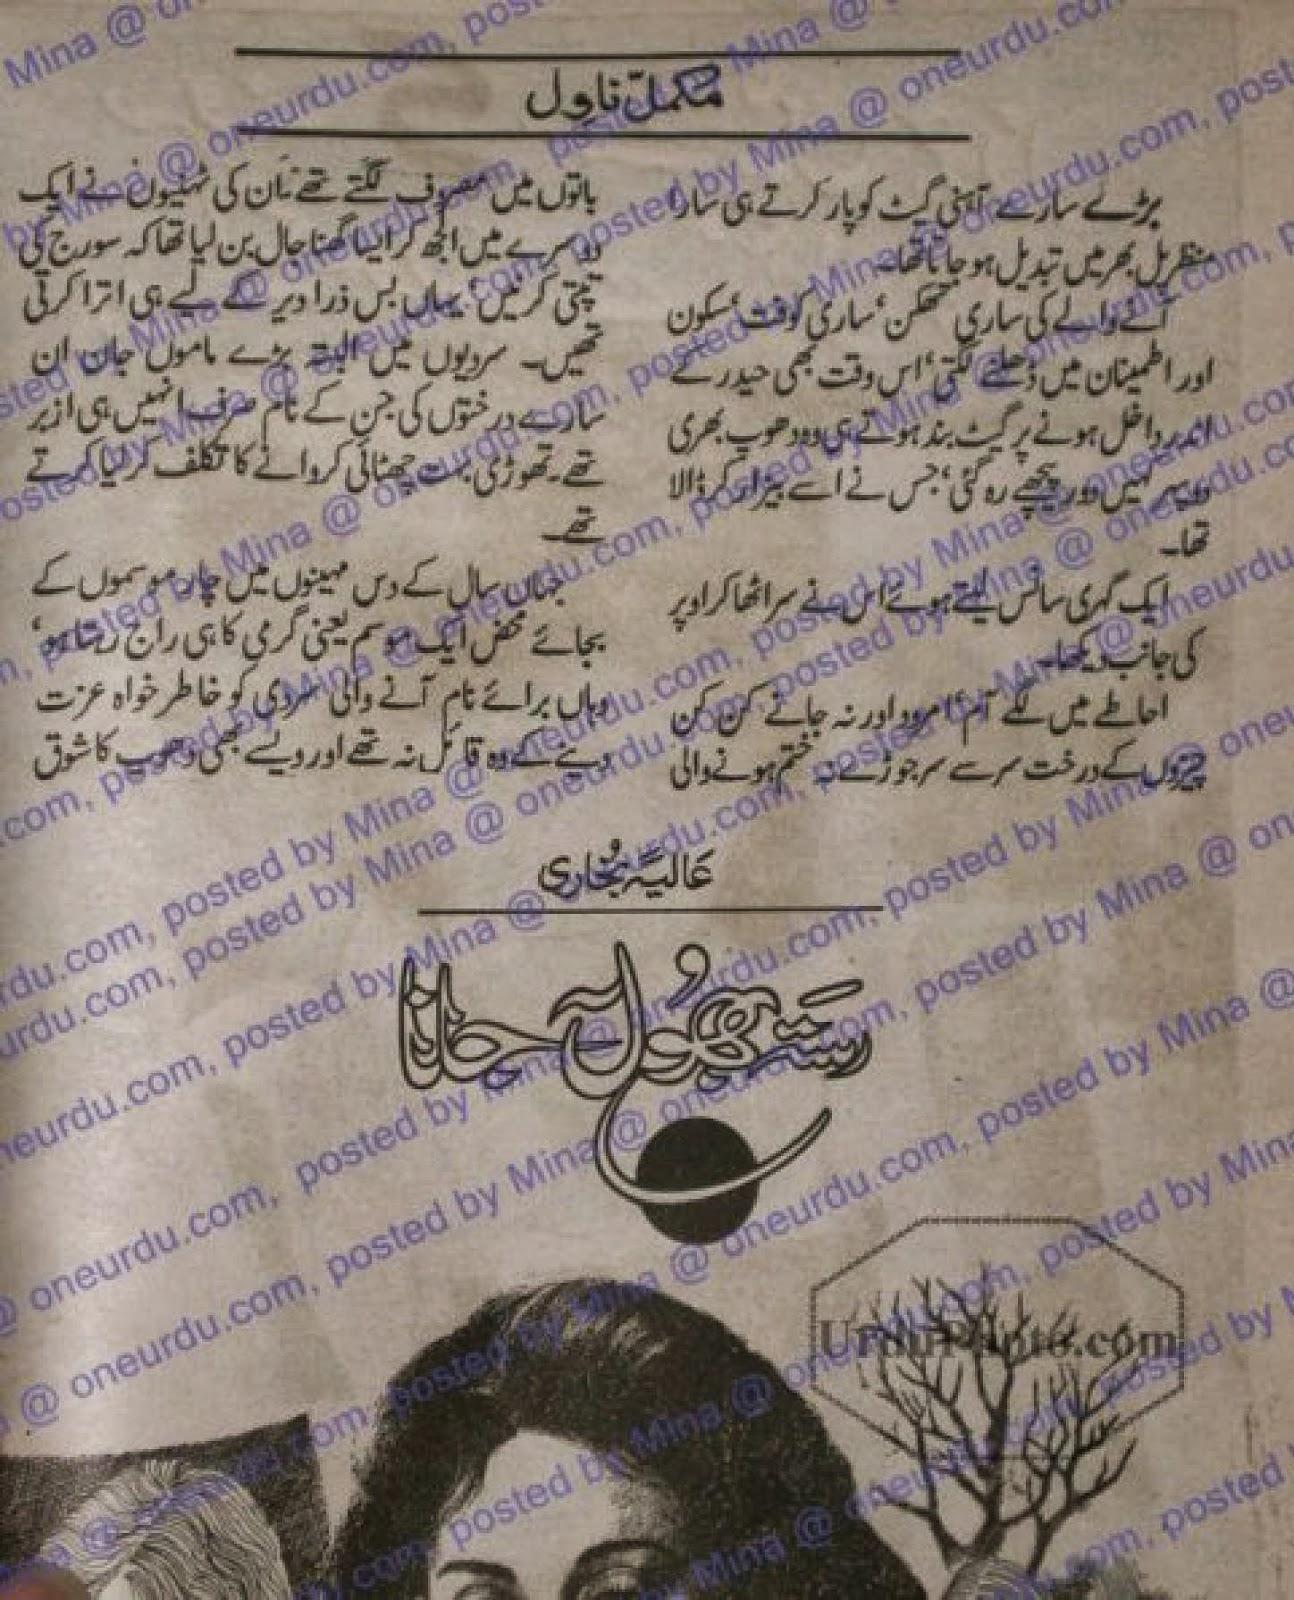 Digest , Novels , islamic Books , English Books and Magazine Free